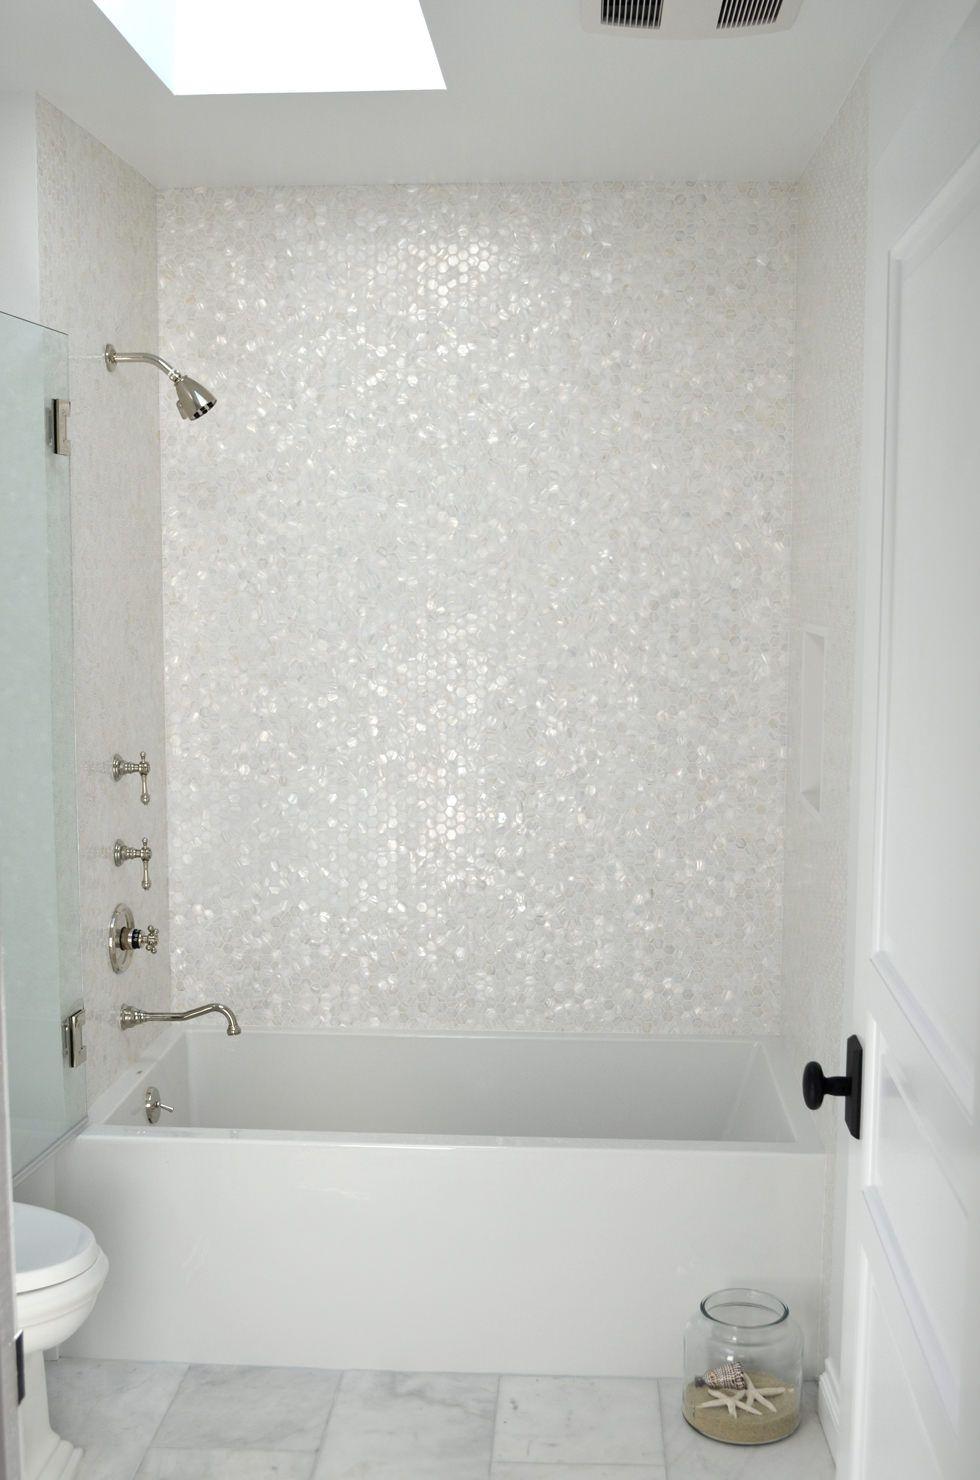 Piastrelle bagno esagonali simple piastrelle per bagni moderni effetto mosaico esagonale - Piastrelle bagno mosaico ...